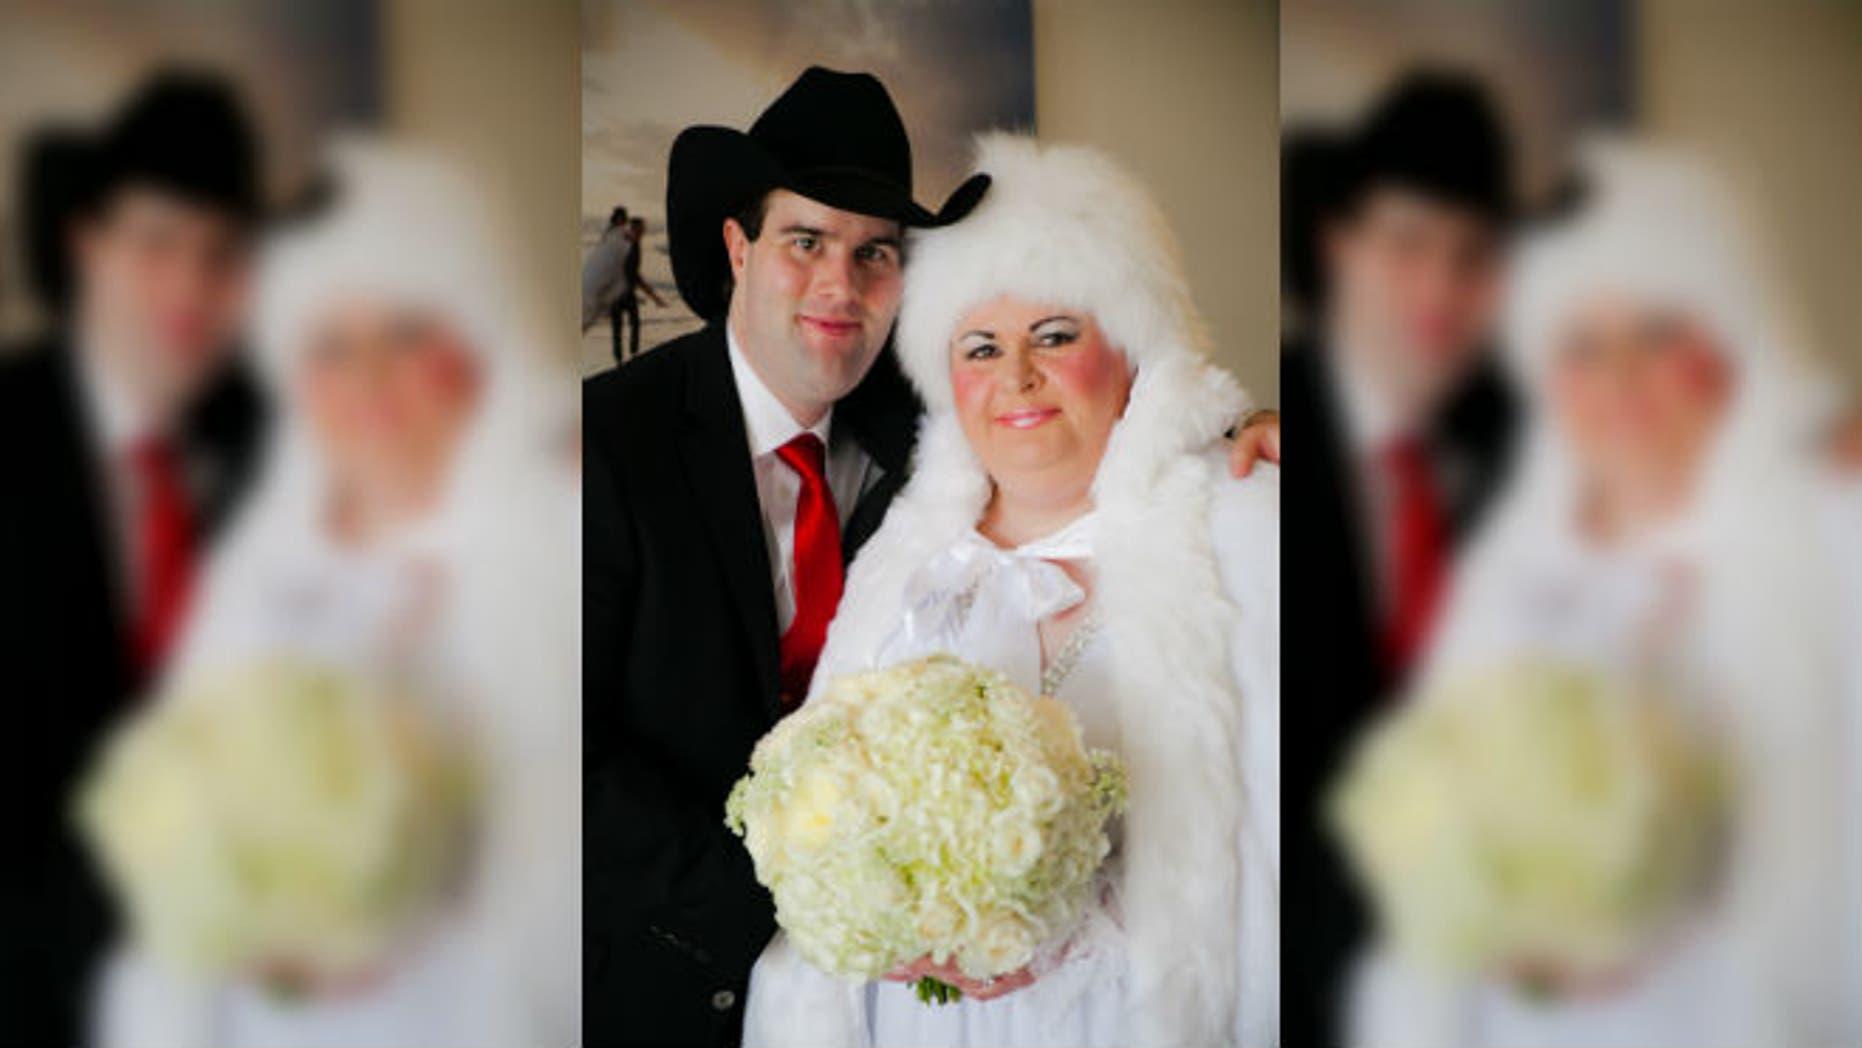 Abraham Talmage Nielsen and Anita Lesko on their wedding day.  (image: Kristina Bant Jenkins)